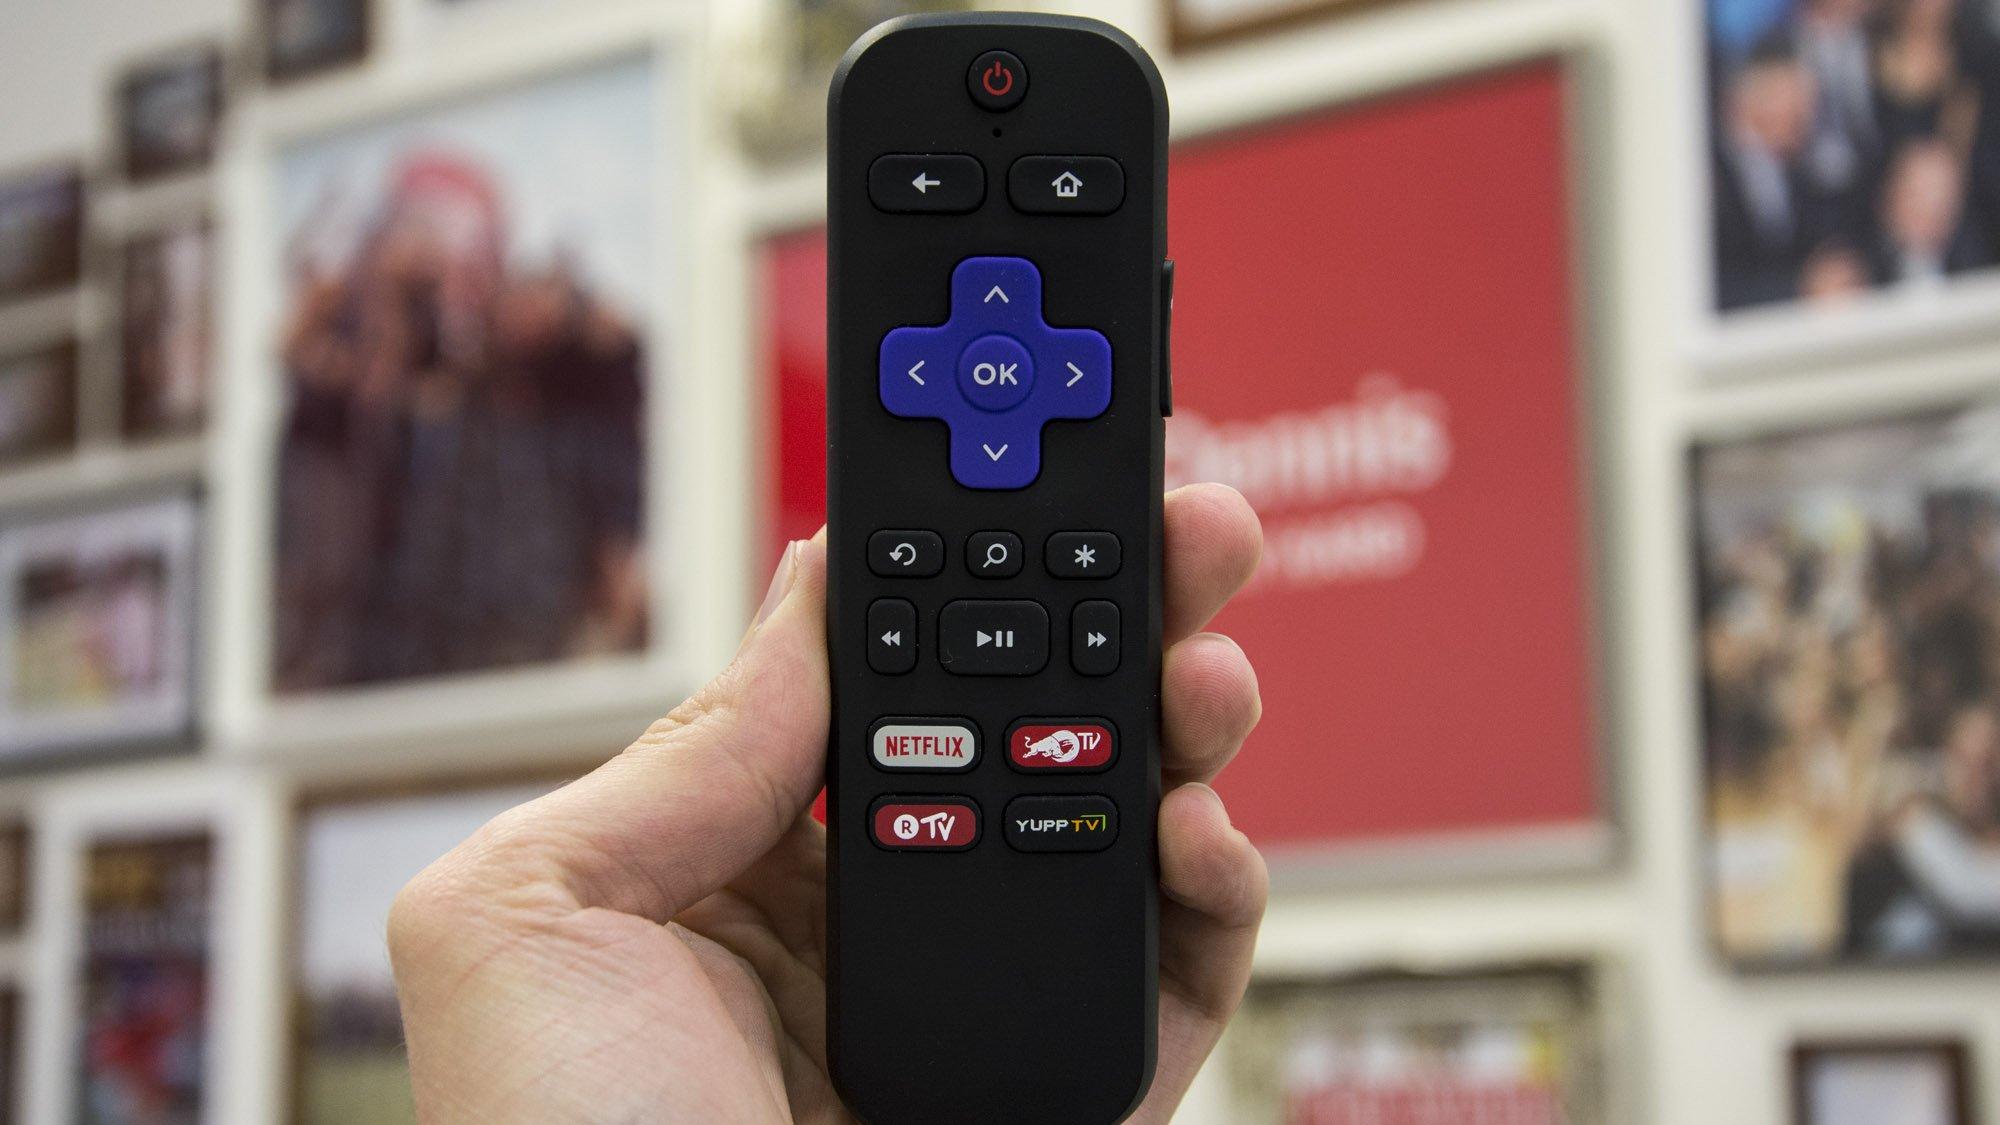 Amazon Fire TV Stick vs Chromecast vs Now TV Stick vs Roku